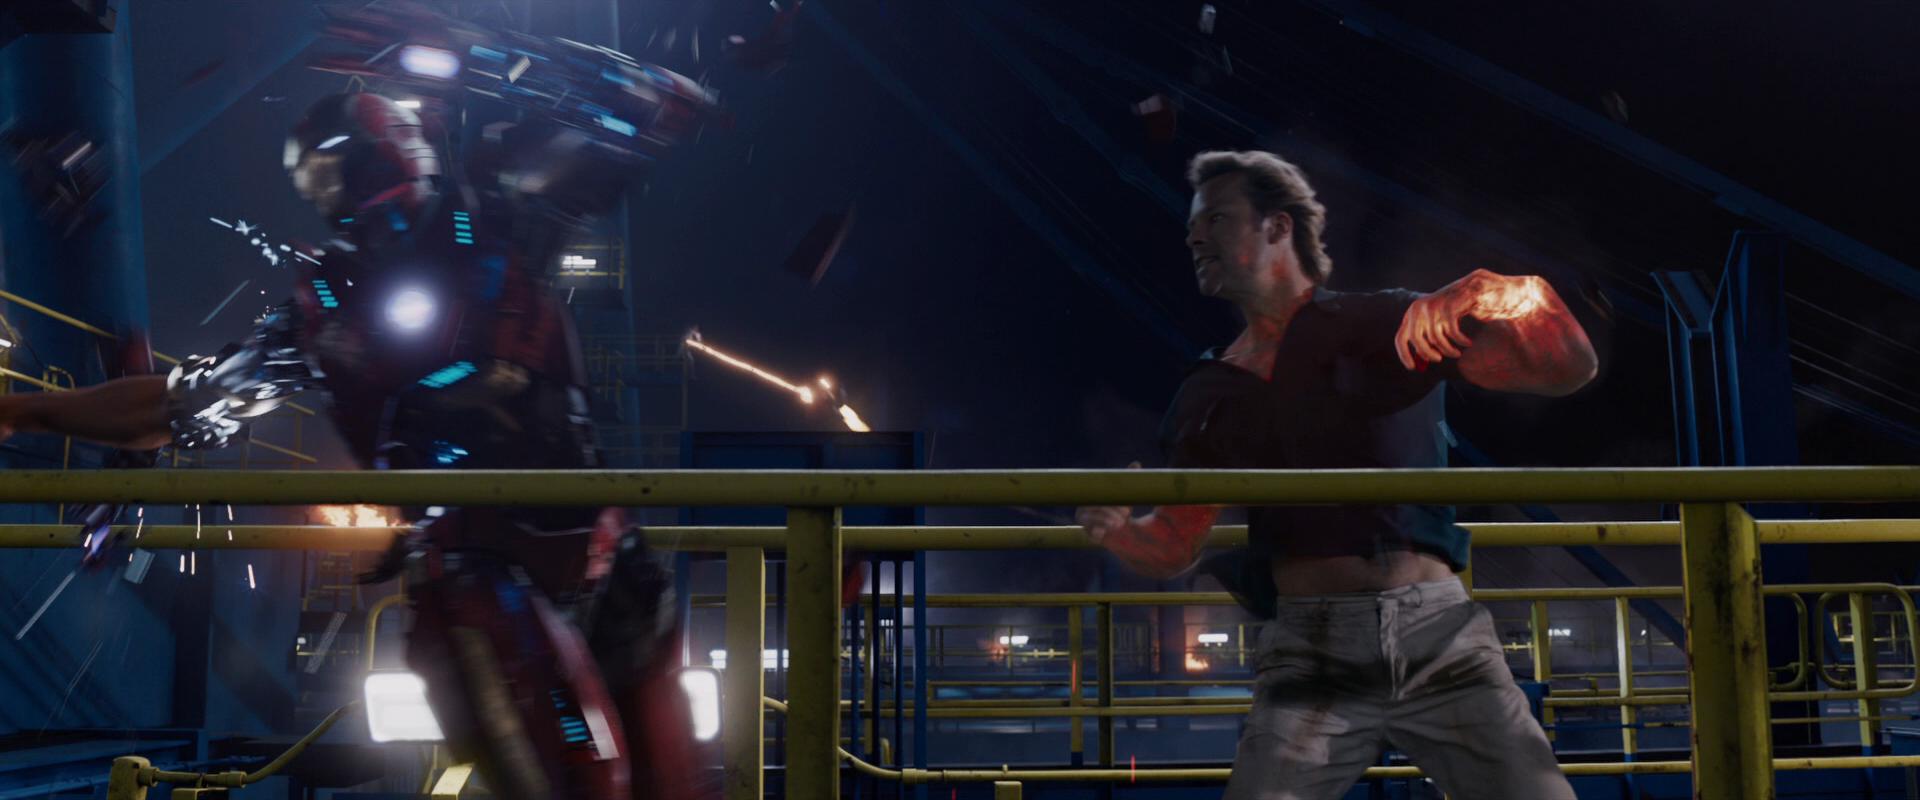 Iron Man Disney Wiki Fandom Powered By Wikia Mcu Controlled Spot Welder